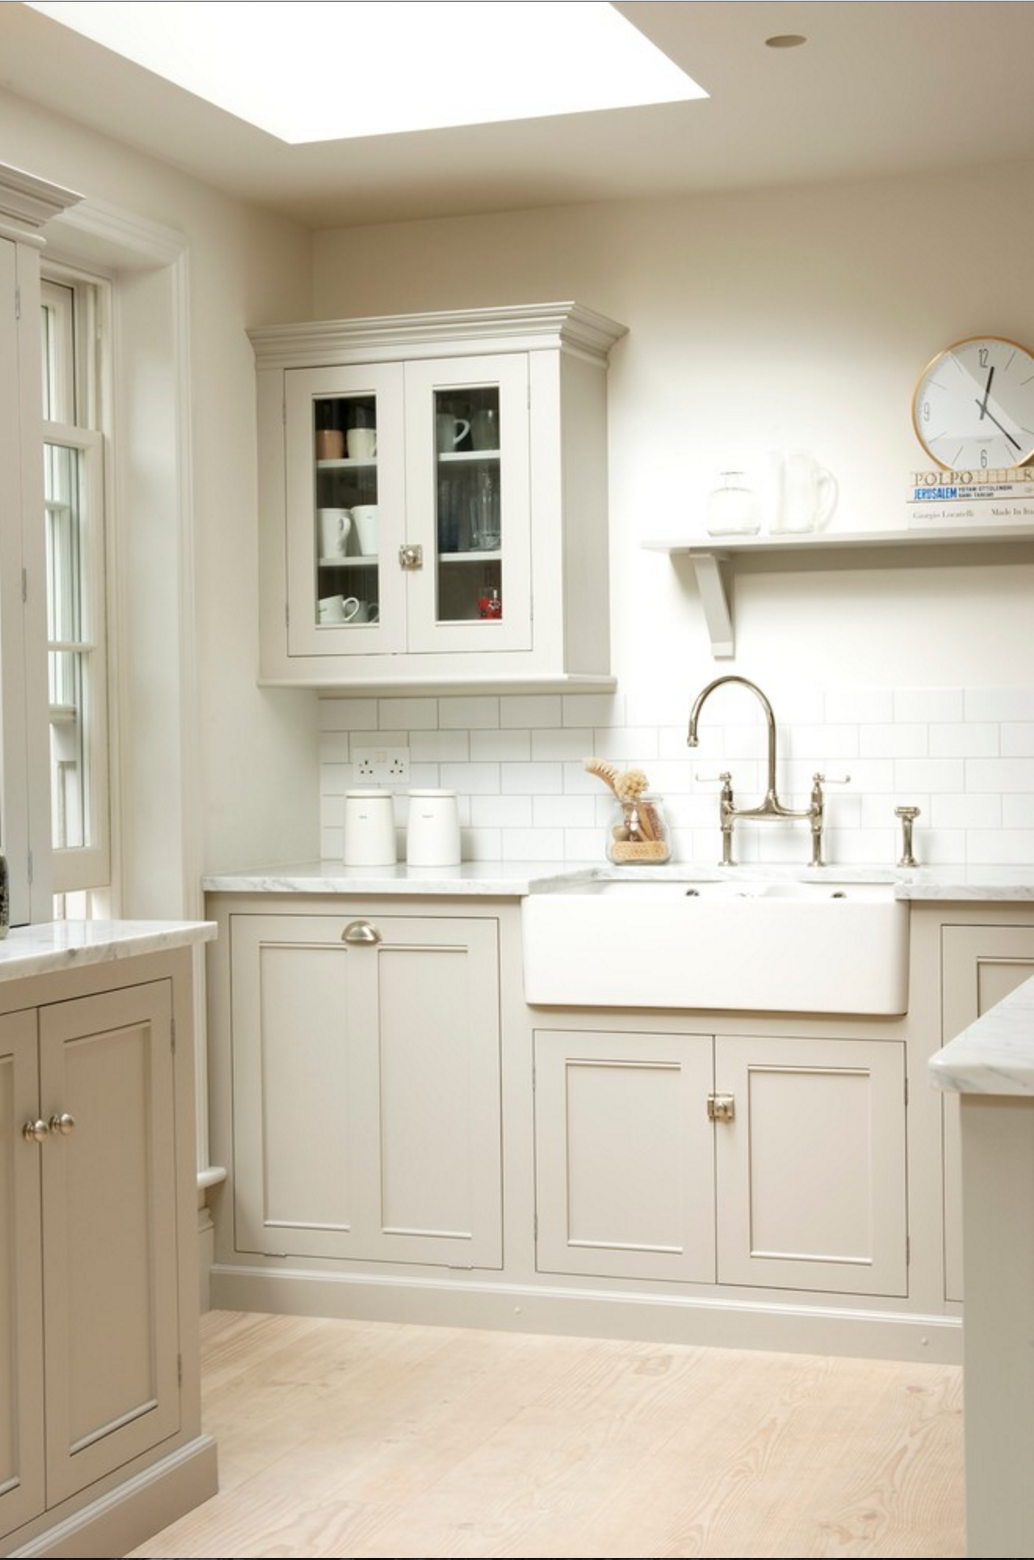 Pavillion greyu painted kitchen cabinets kitchen in